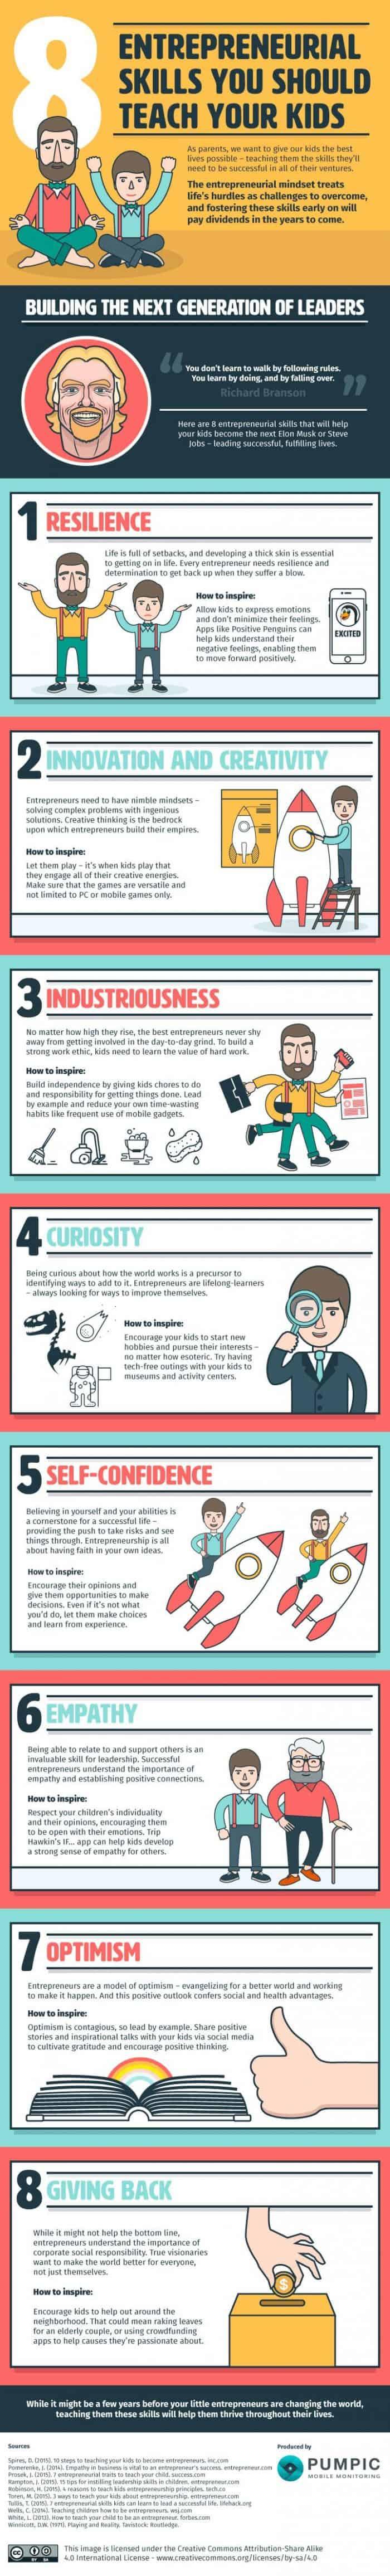 infographic describes Entrepreneurial skills for children